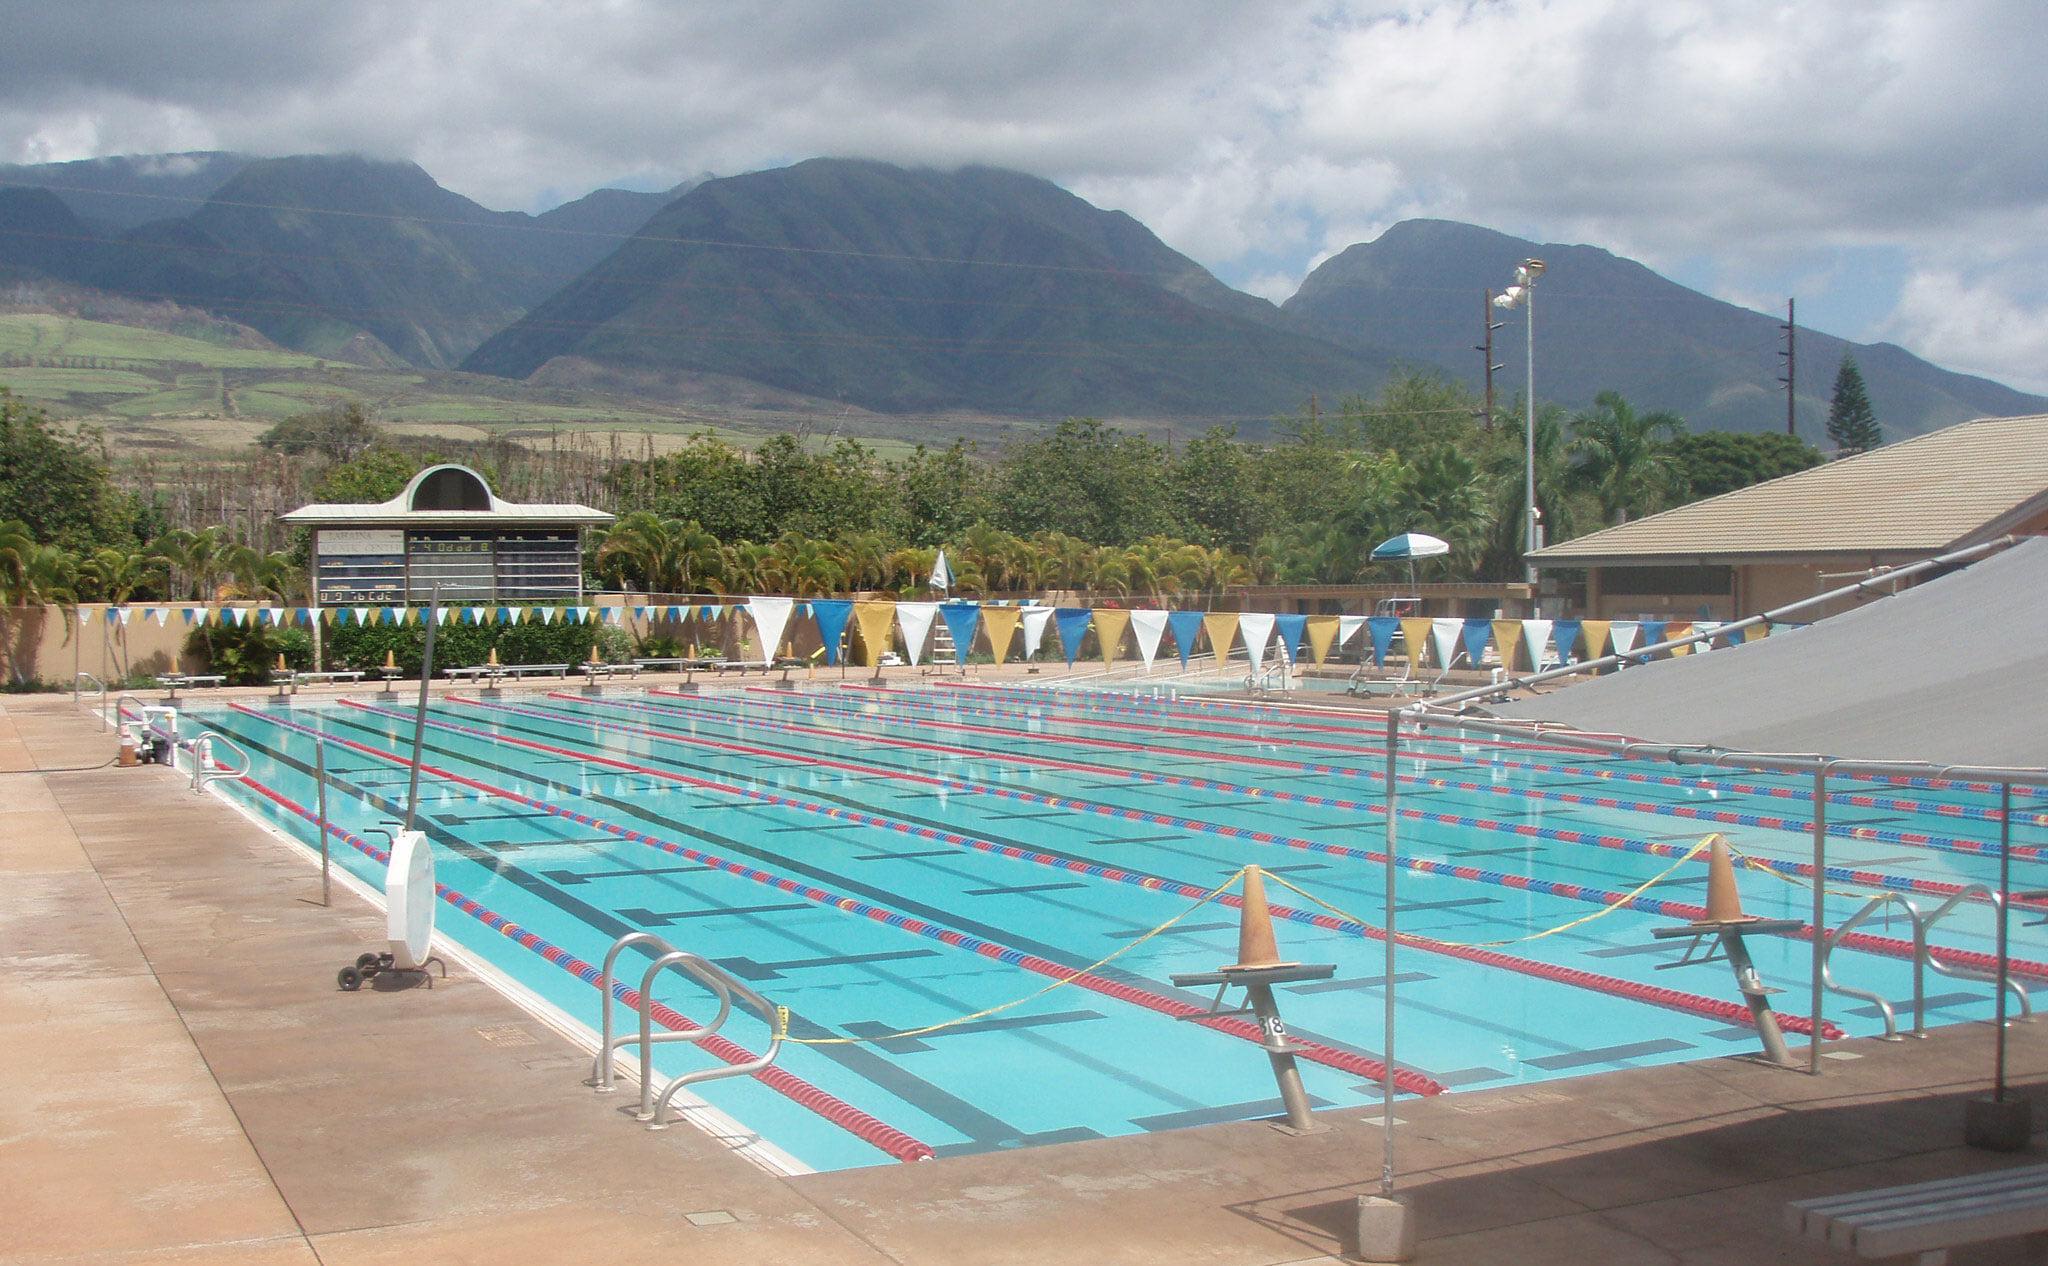 Lahaina Aquatic Center Closed for Improvements, June 7-14